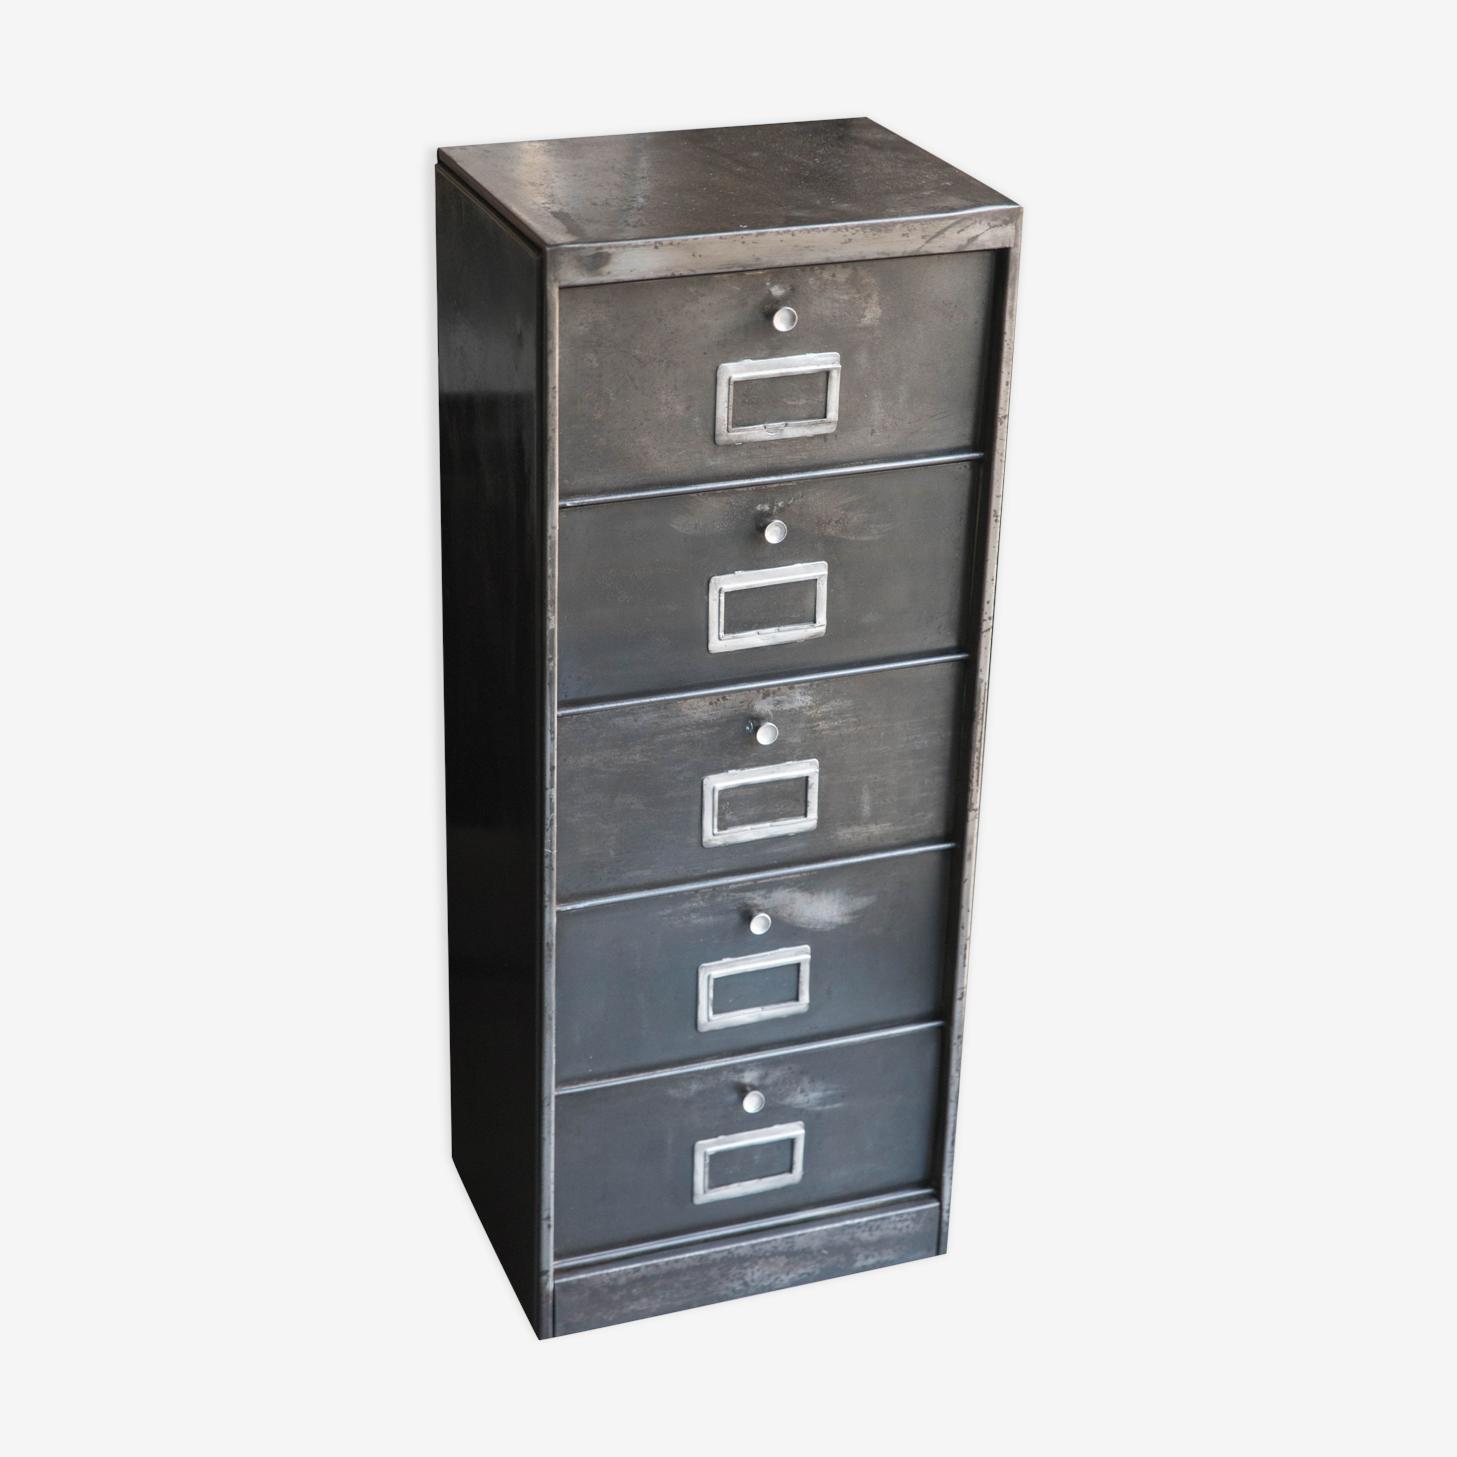 5 industrial locker lockers